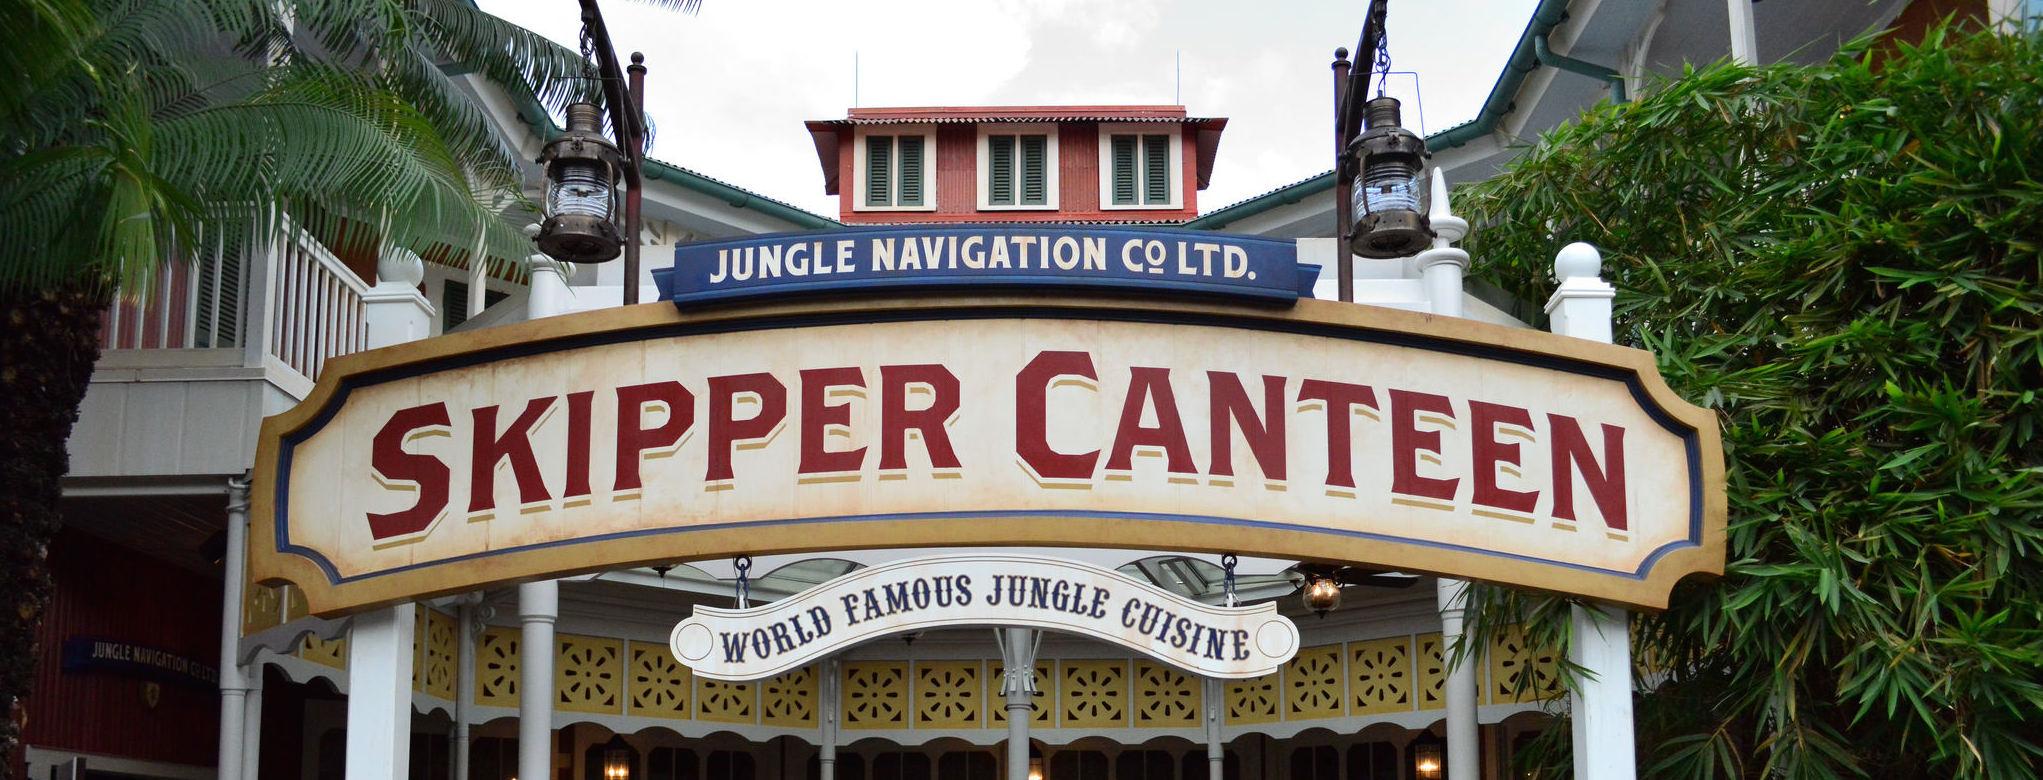 Lummy Food Magic Orlando Me Me Park Me Park Me Disney Plan My Happy Place Magic Kingdom Locations Magic Kingdom Places nice food Magic Kingdom Dining